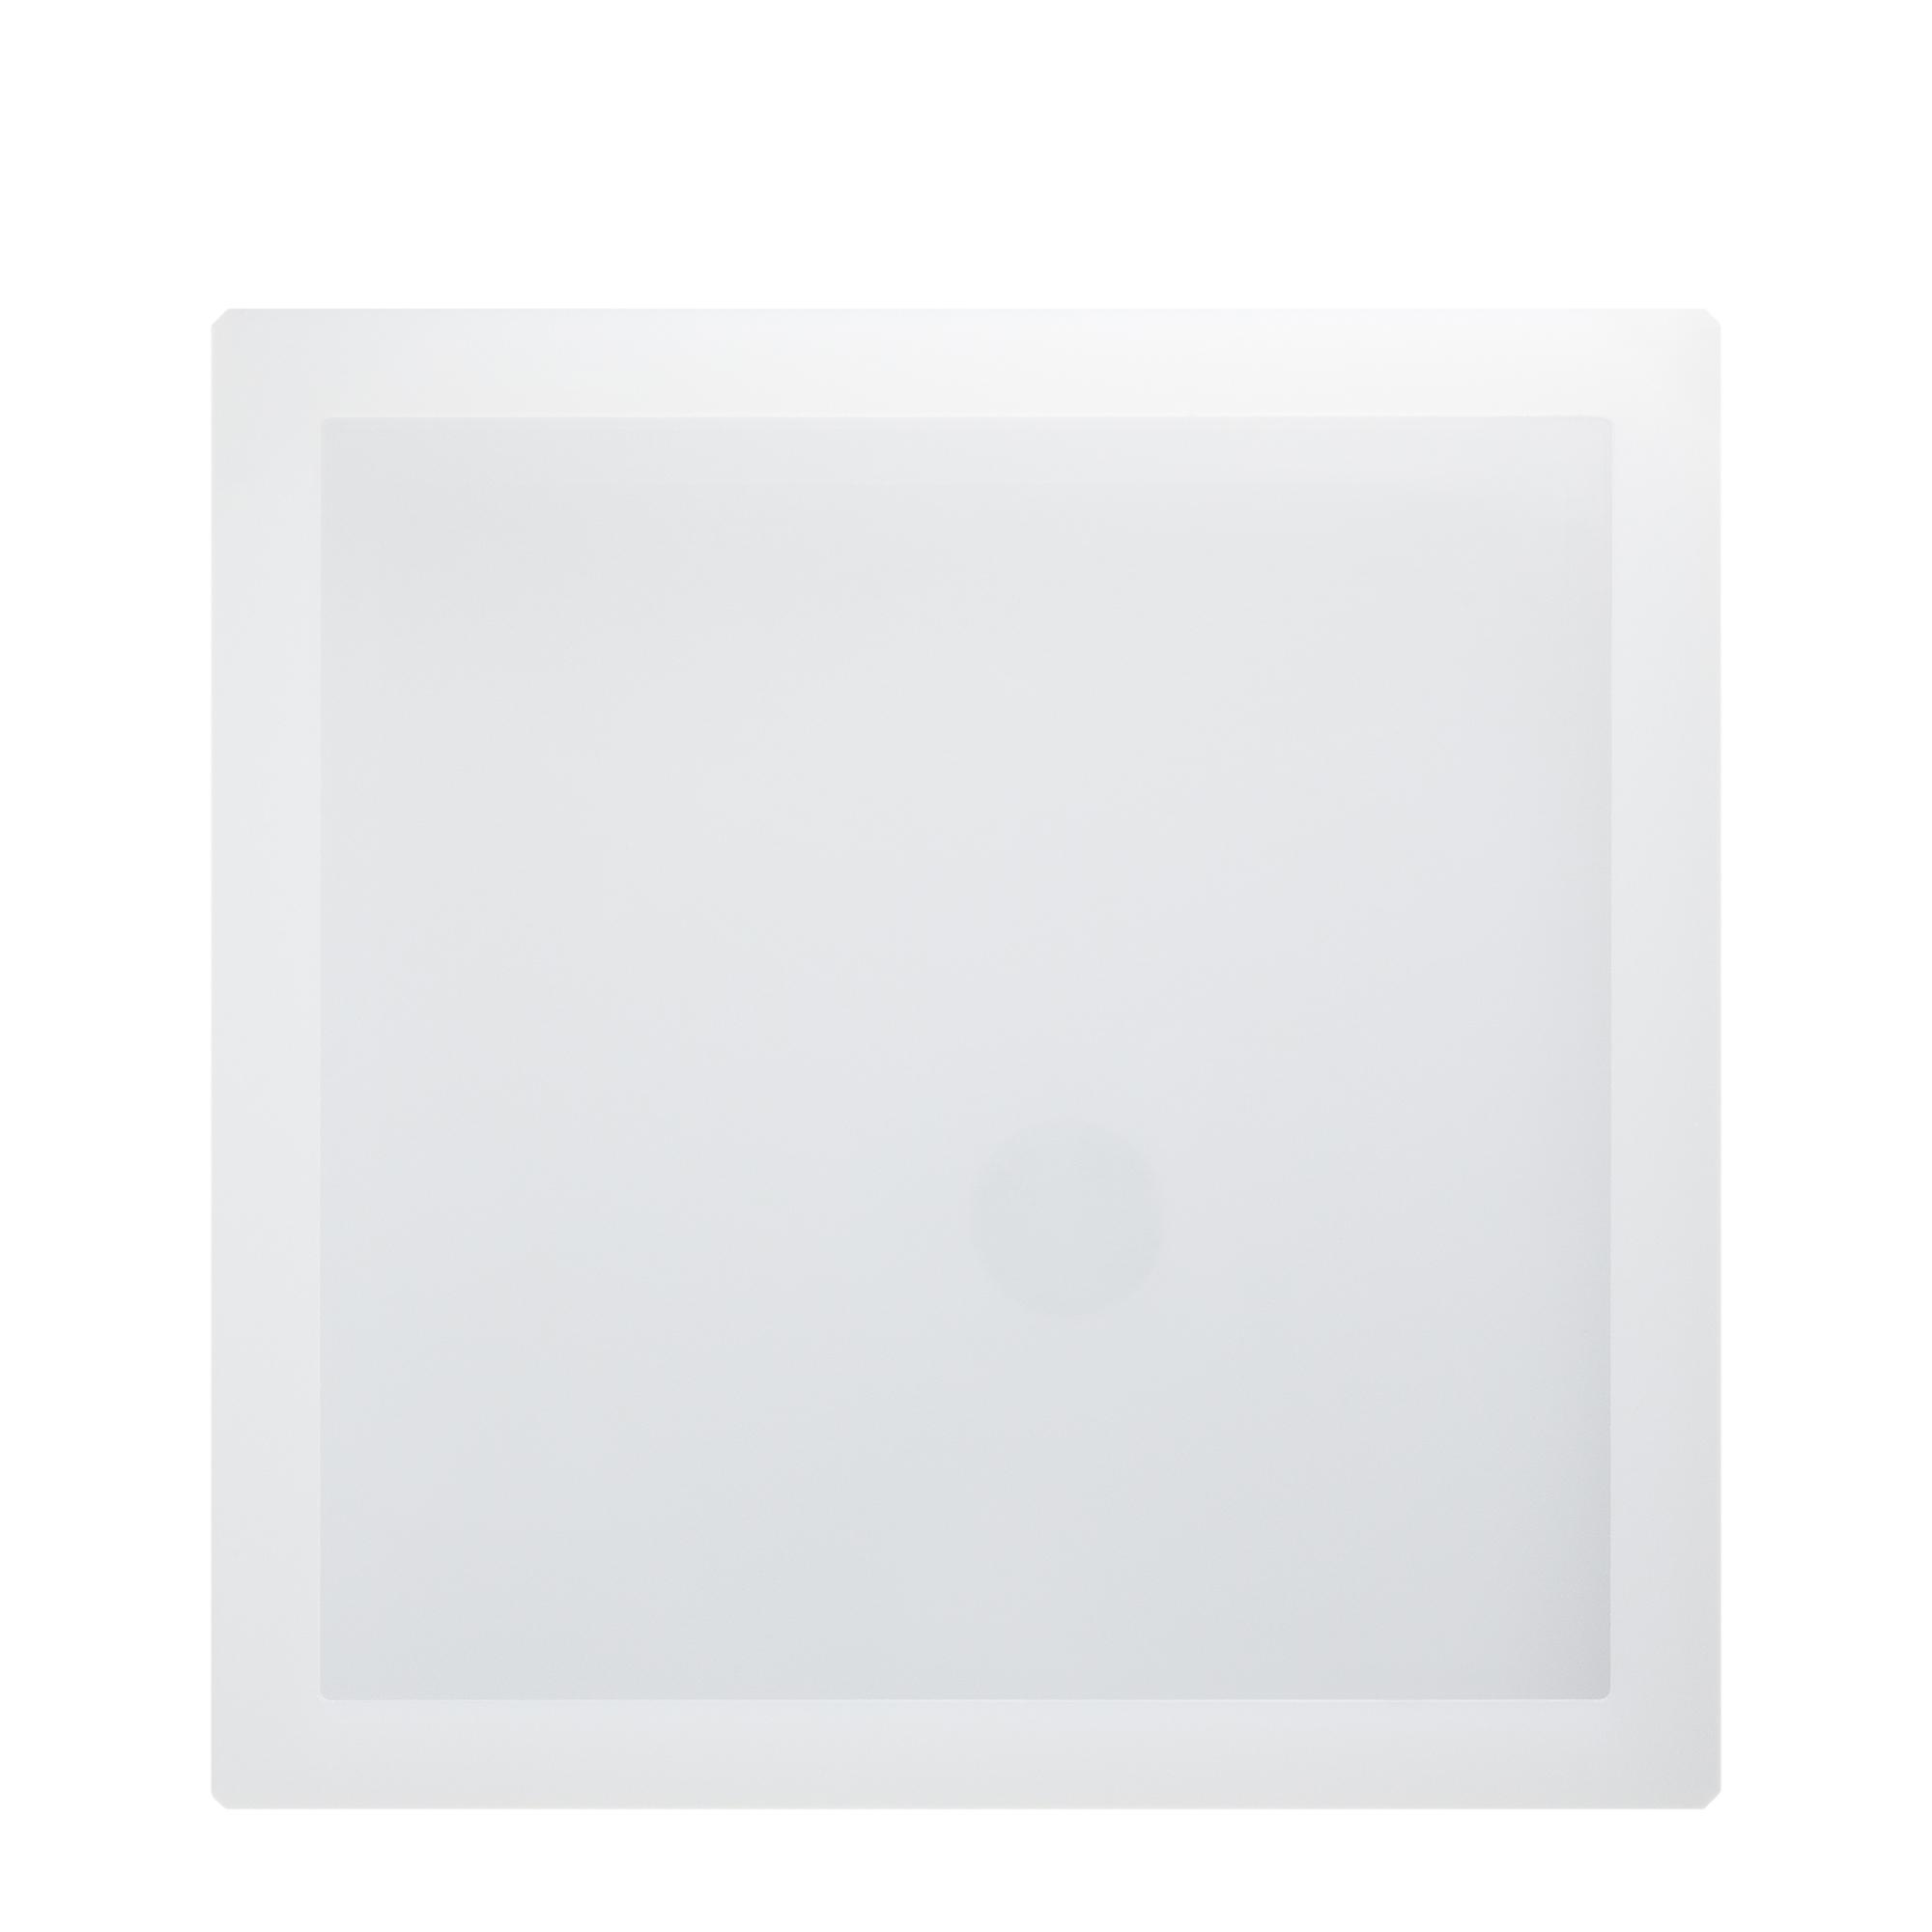 Casting Frame Mold 0,4